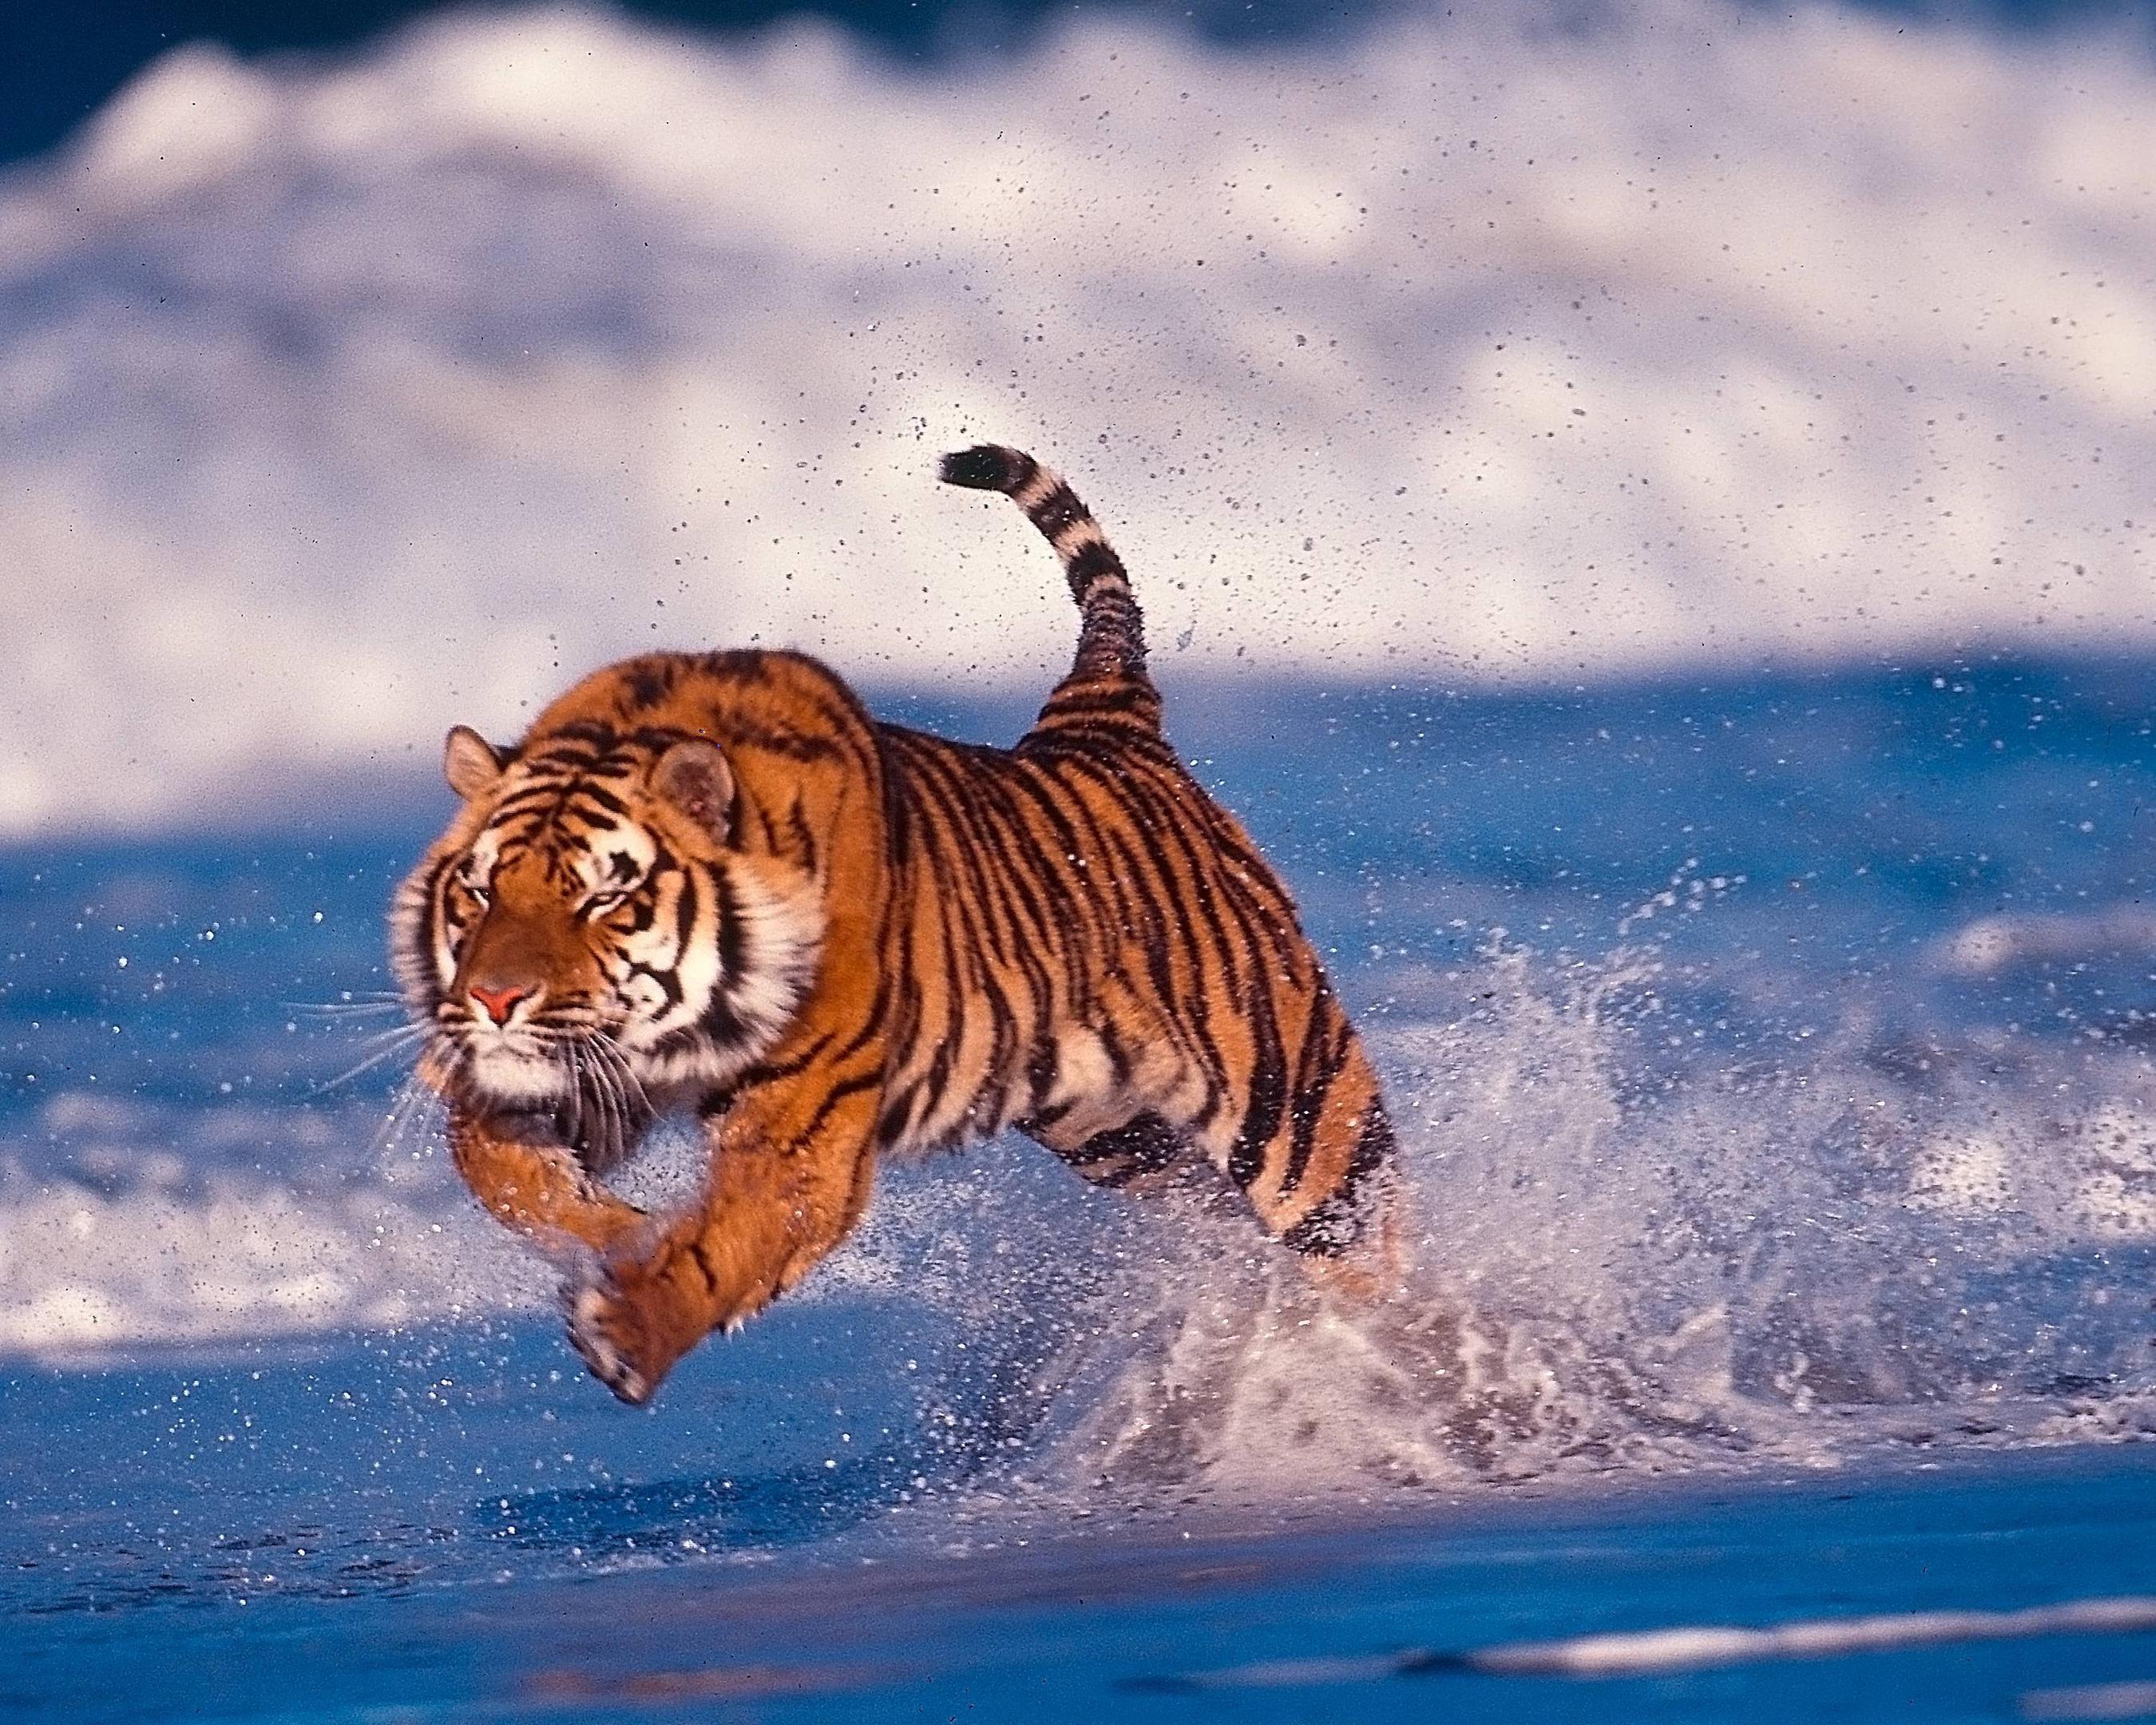 wonderful tiger wallpaper [1920x1080] via classy bro | cool